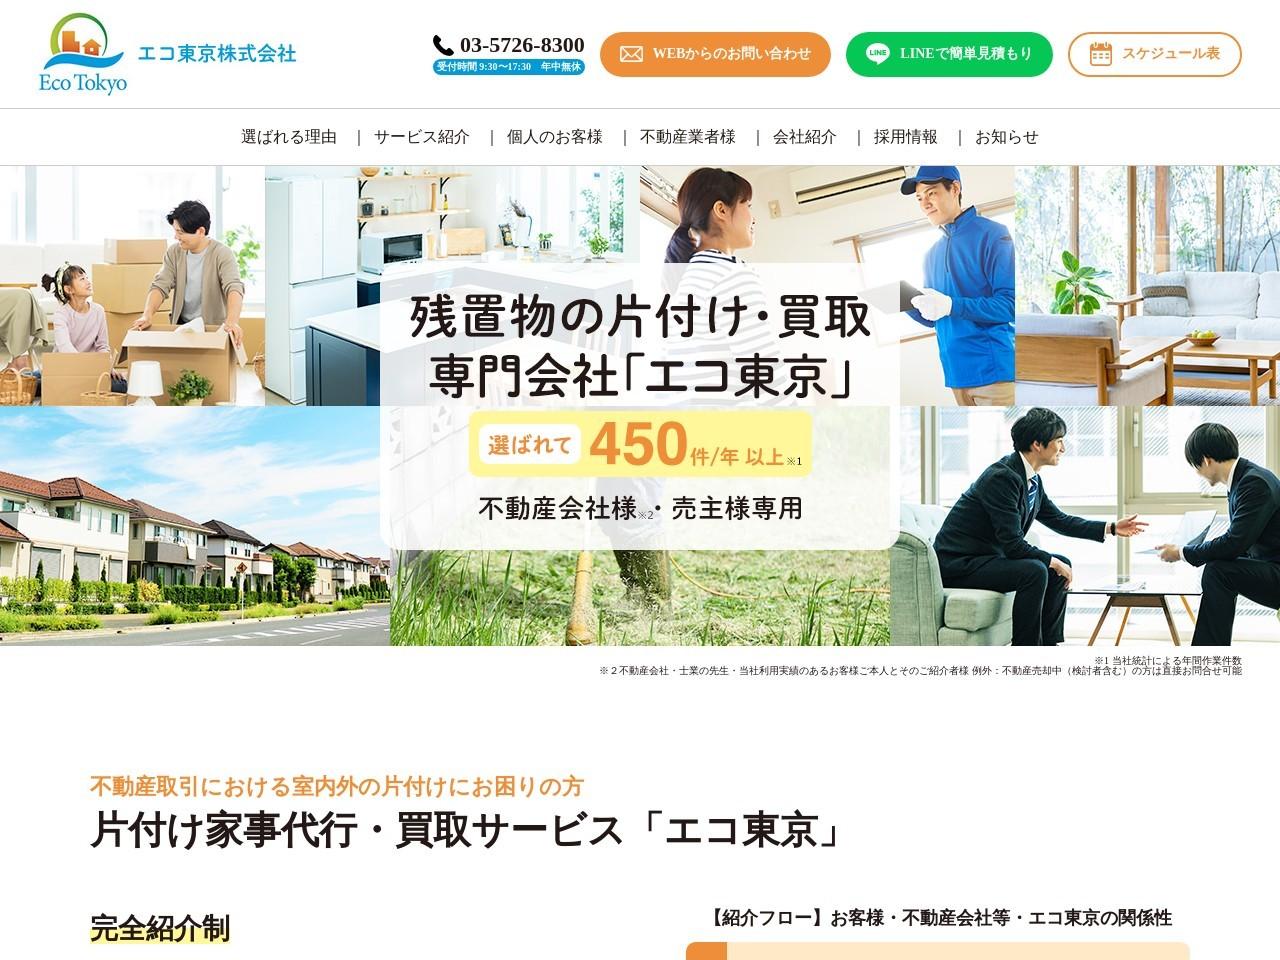 エコ東京株式会社